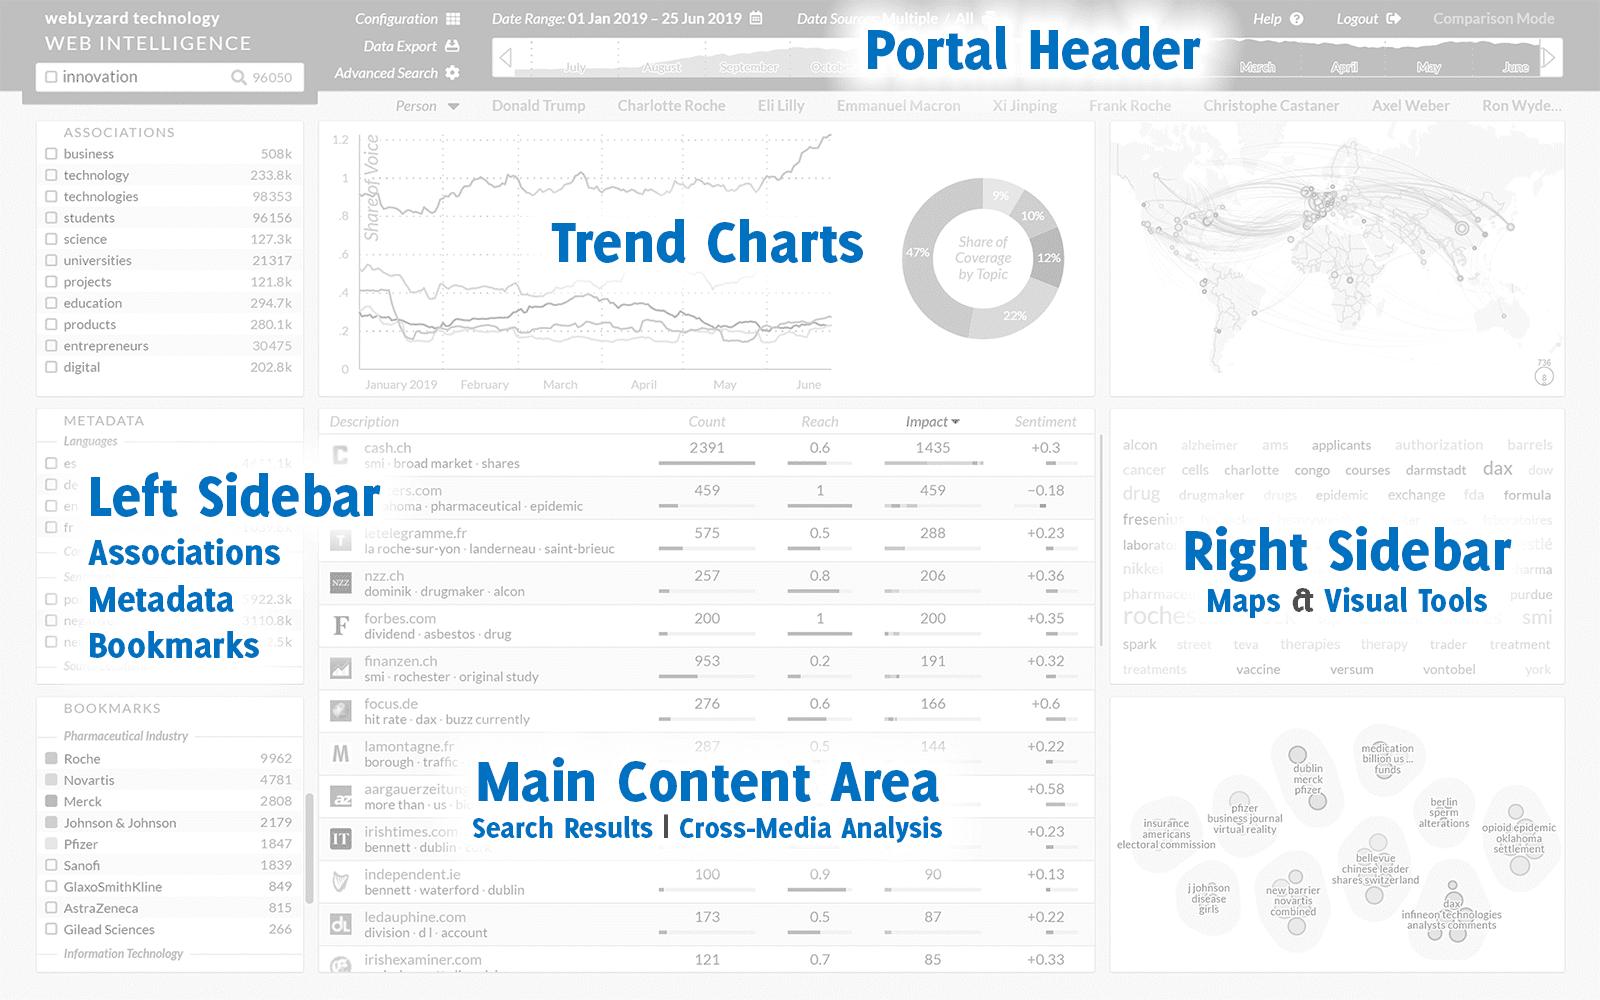 webLyzard Dashboard Overview, June 2019